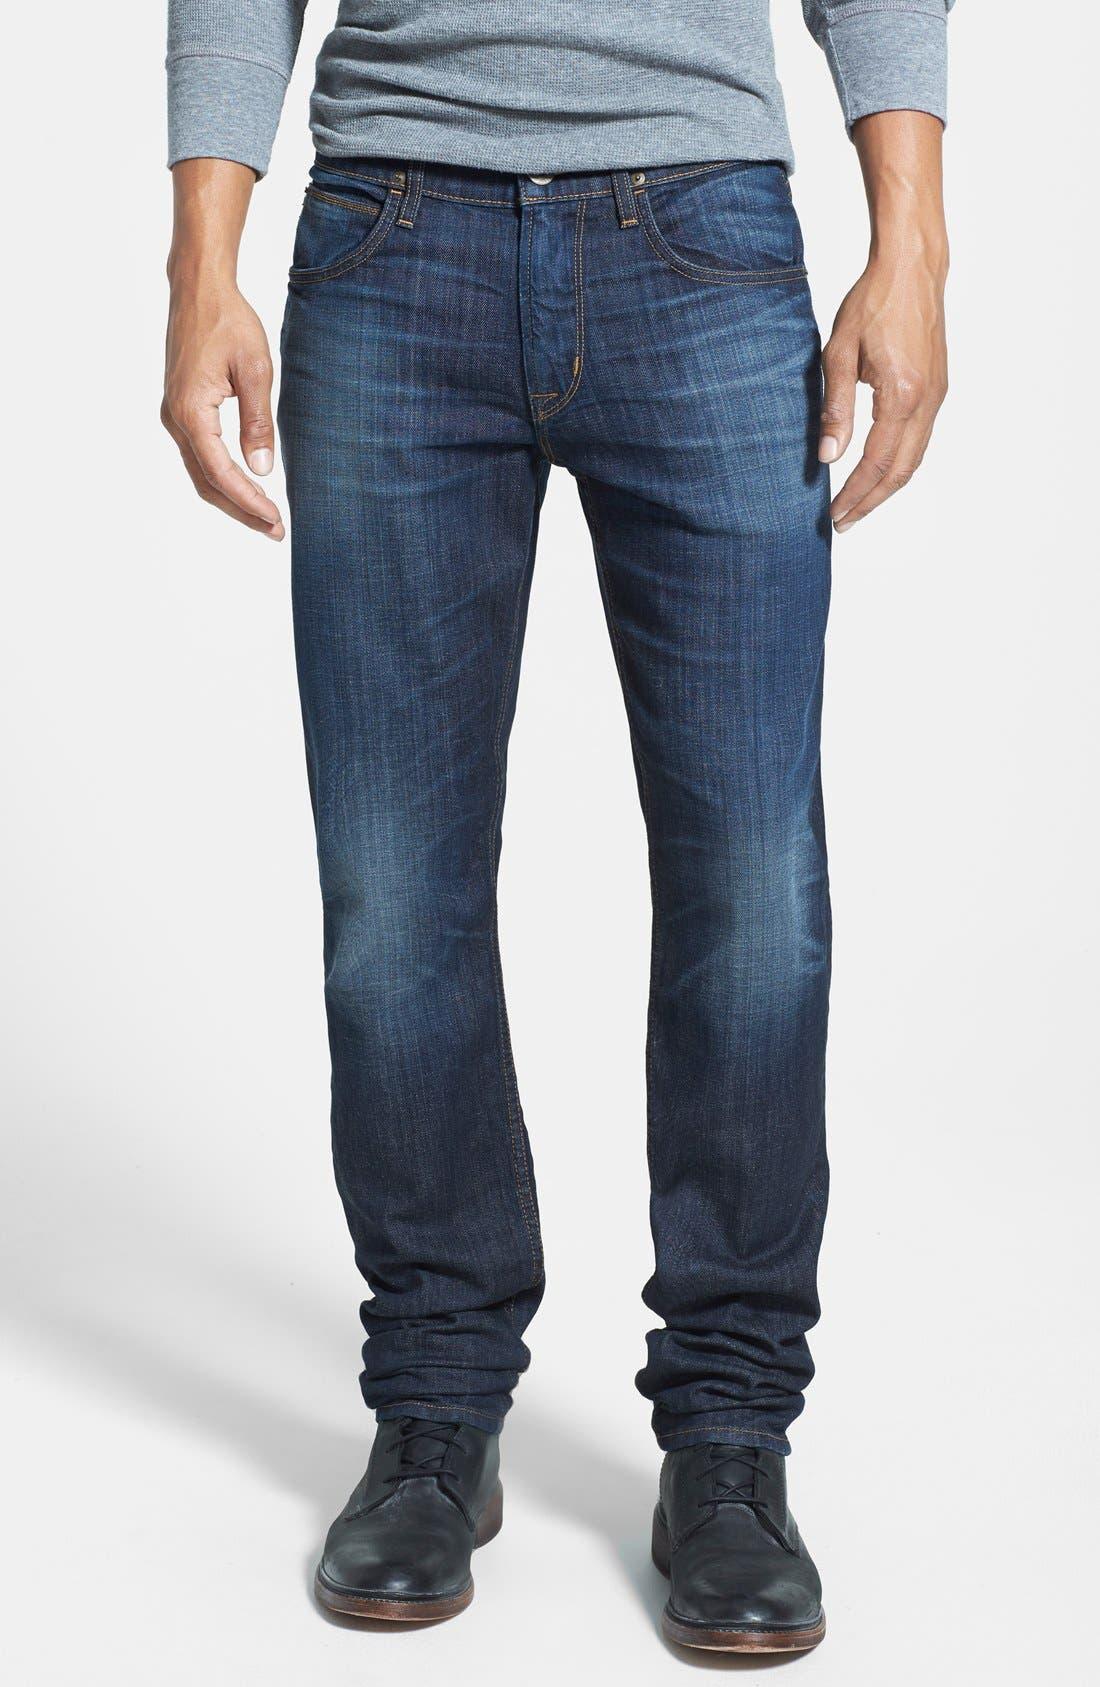 HUDSON JEANS, 'Blake' Slim Fit Jeans, Main thumbnail 1, color, 409